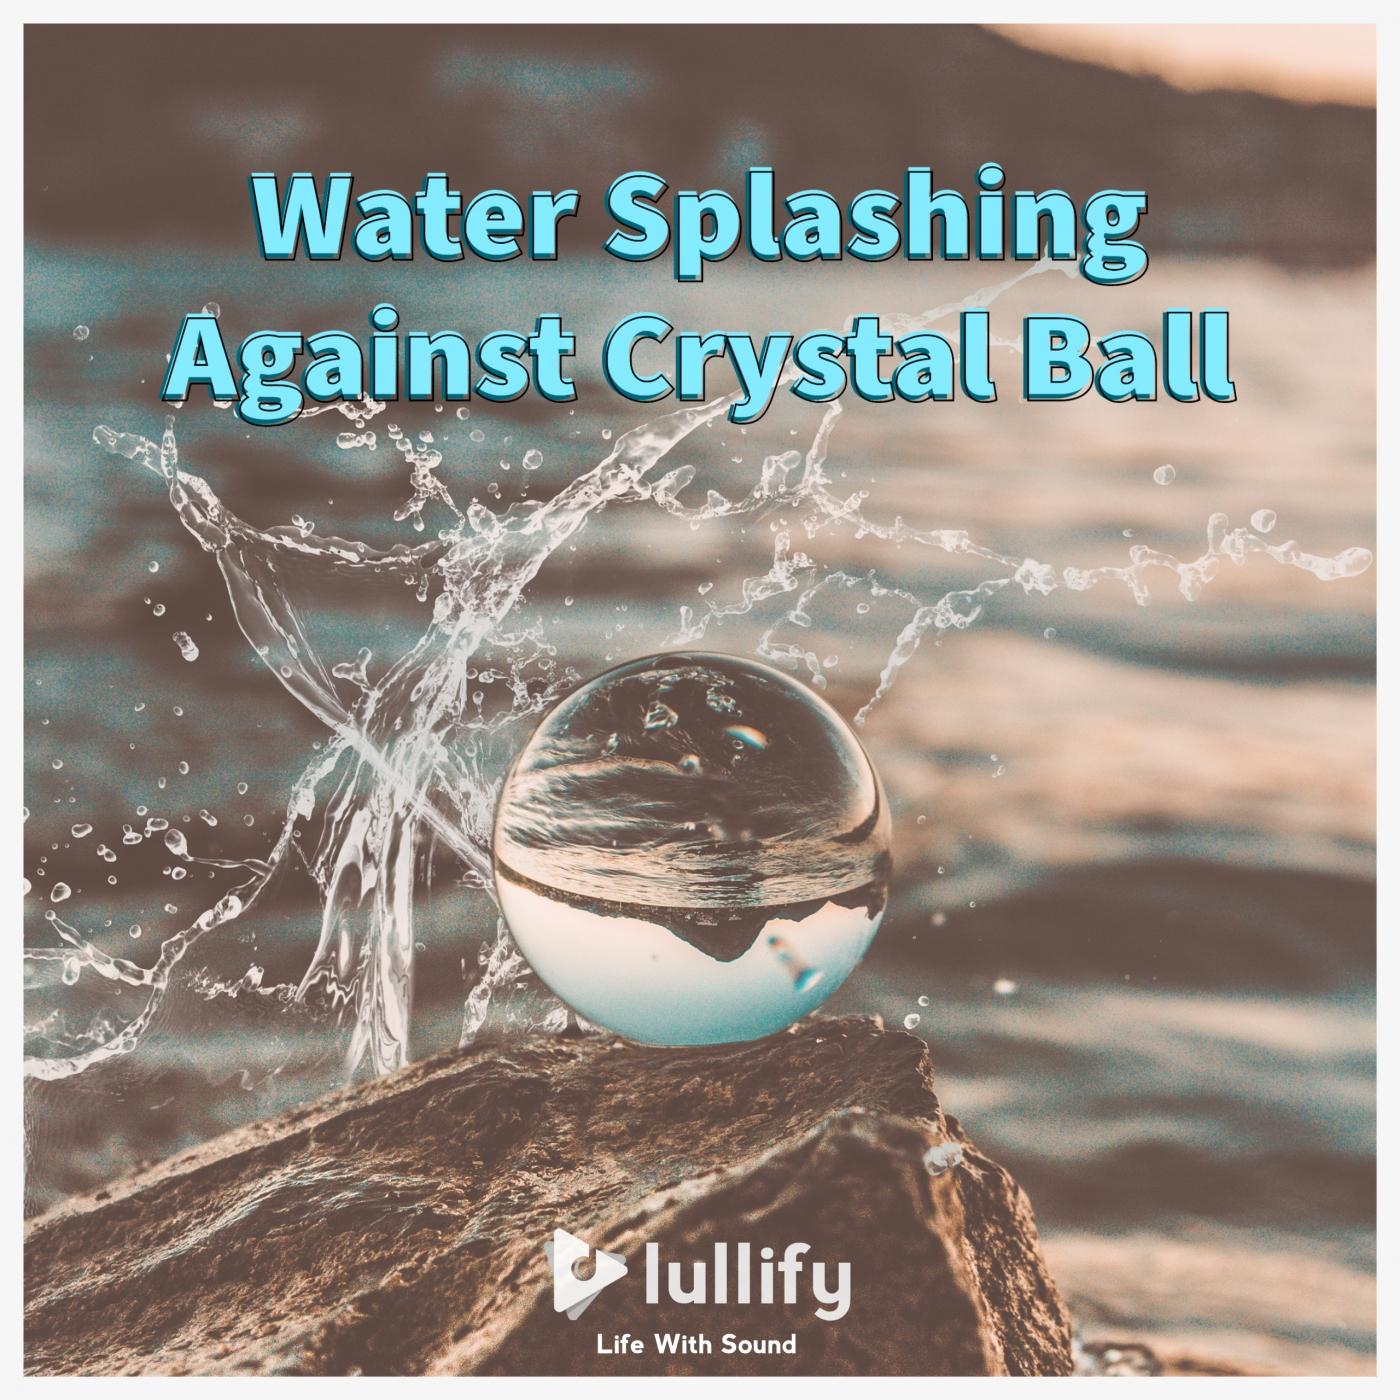 Water Splashing Against Crystal Ball